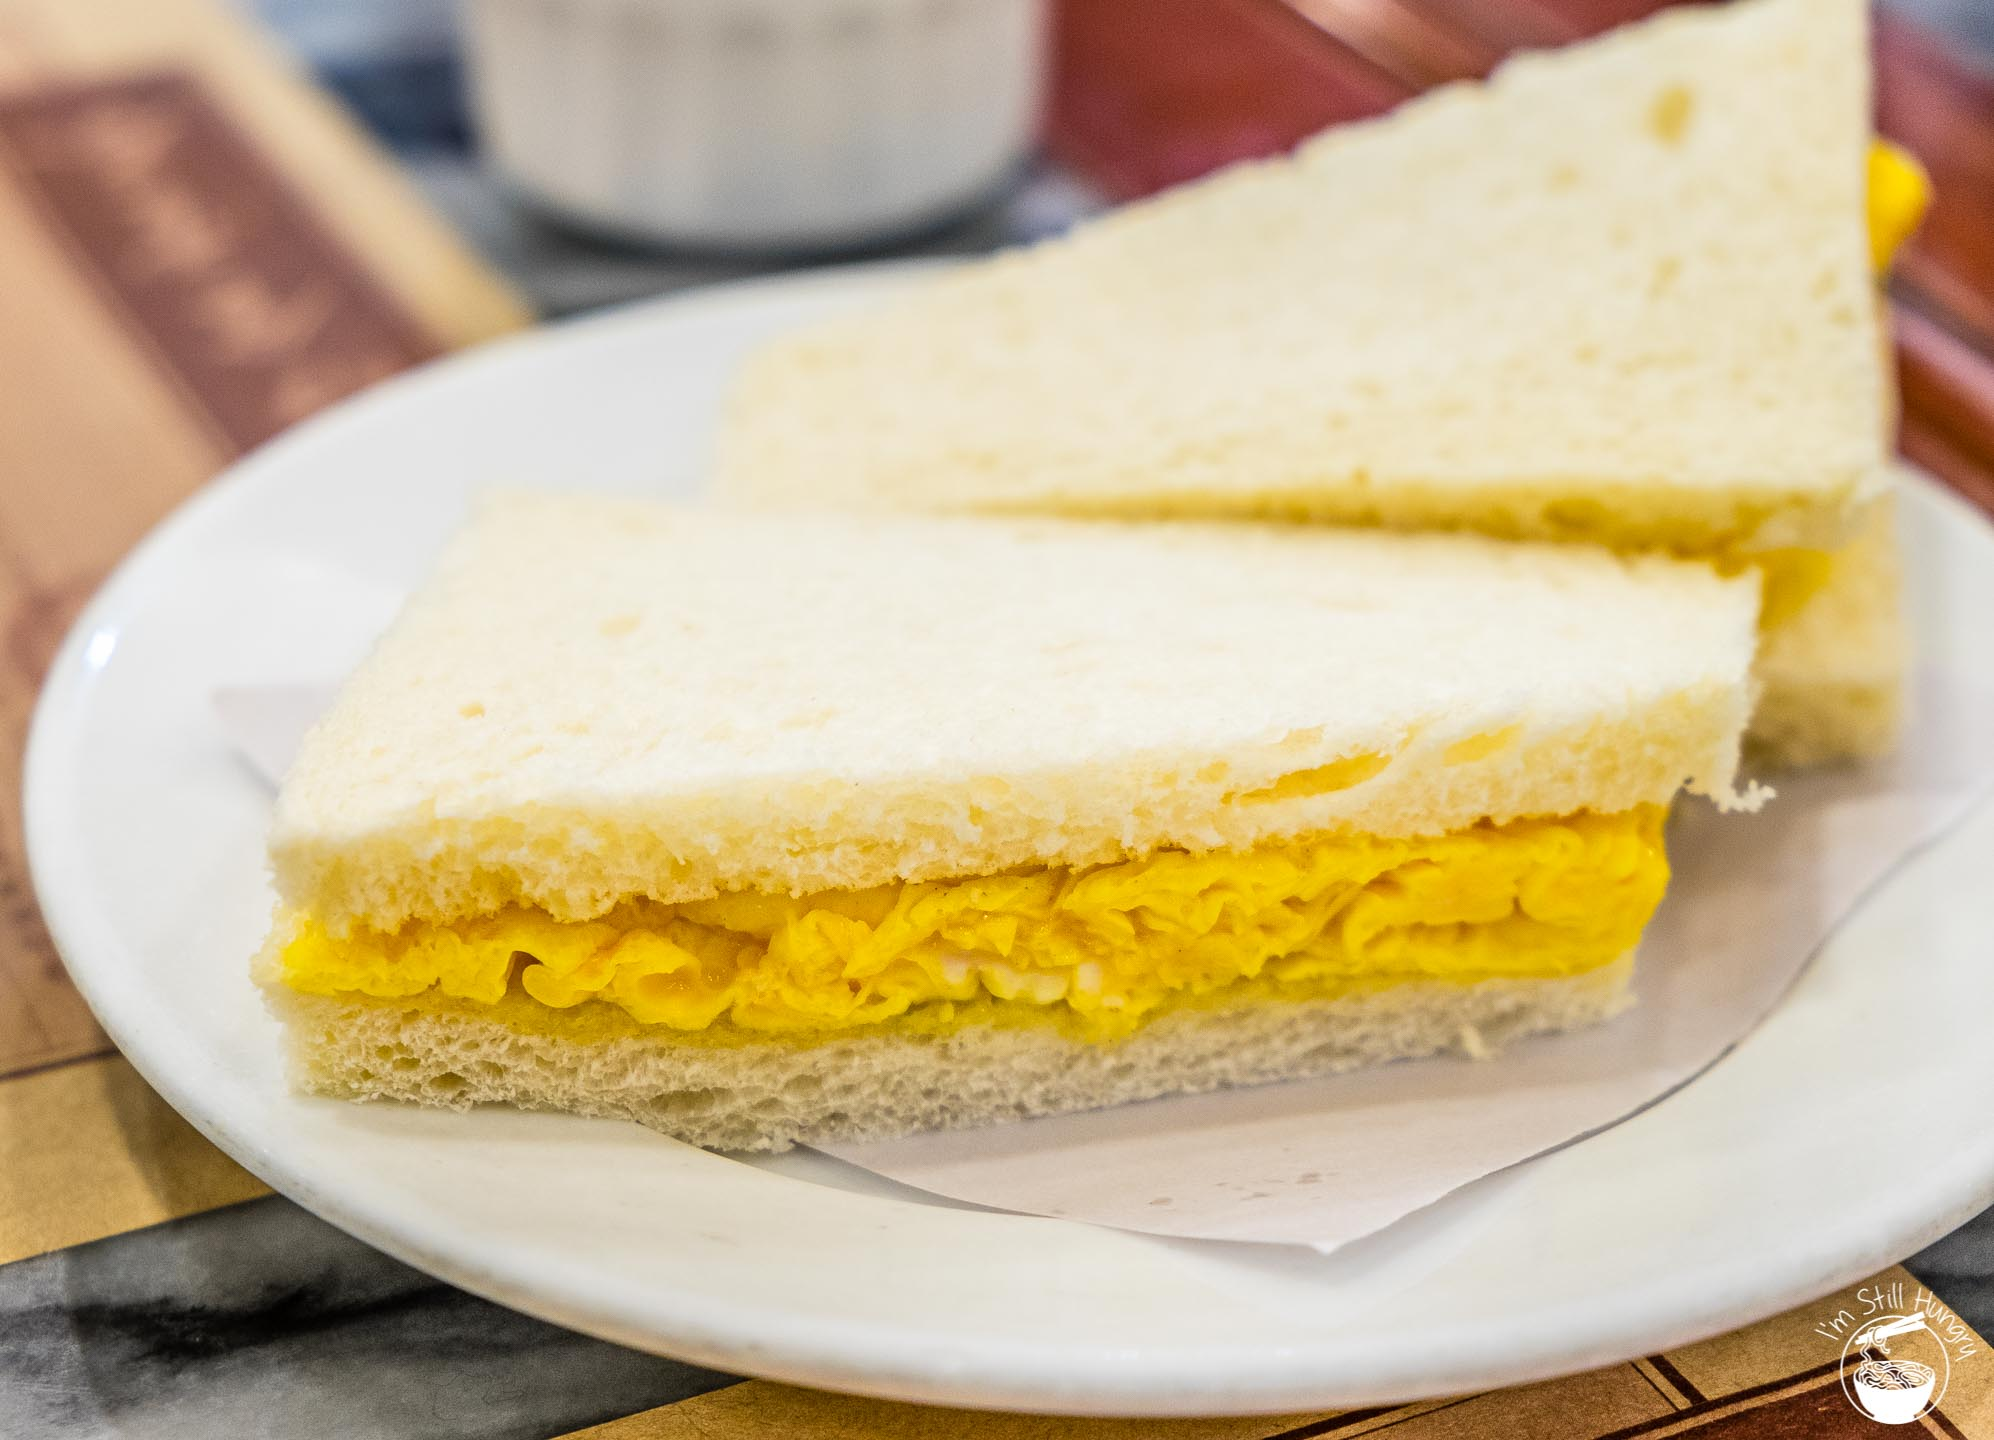 Wong Chi Kei Hong Kong Egg sandwiches. Good, but no Aus Dairy level